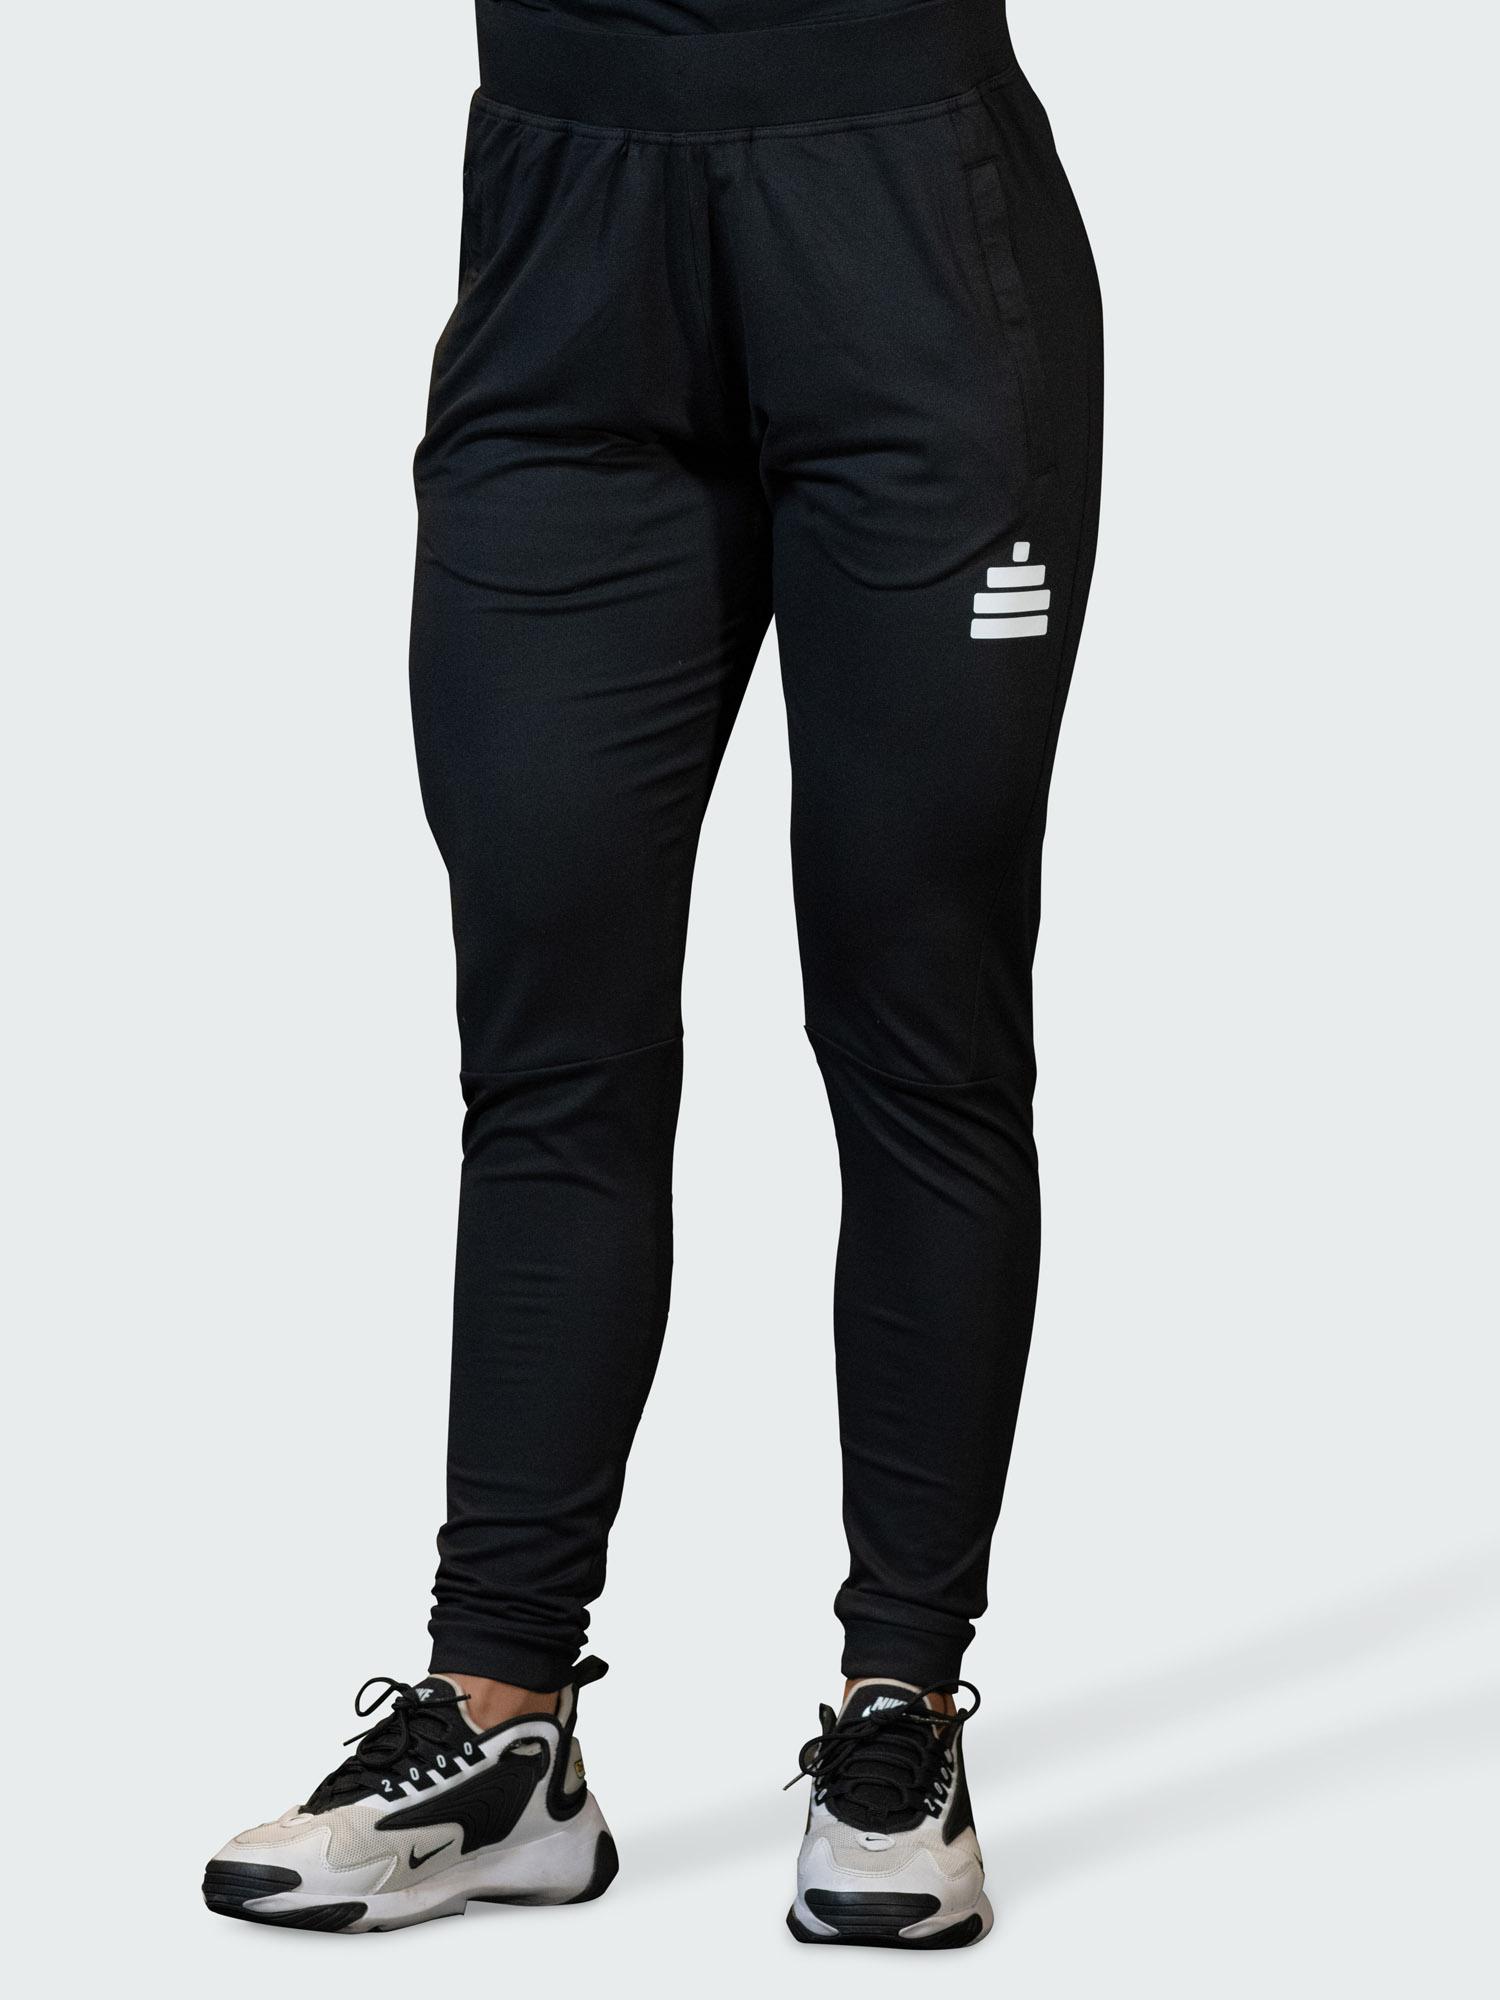 Sweatpants Breeze Womens Black